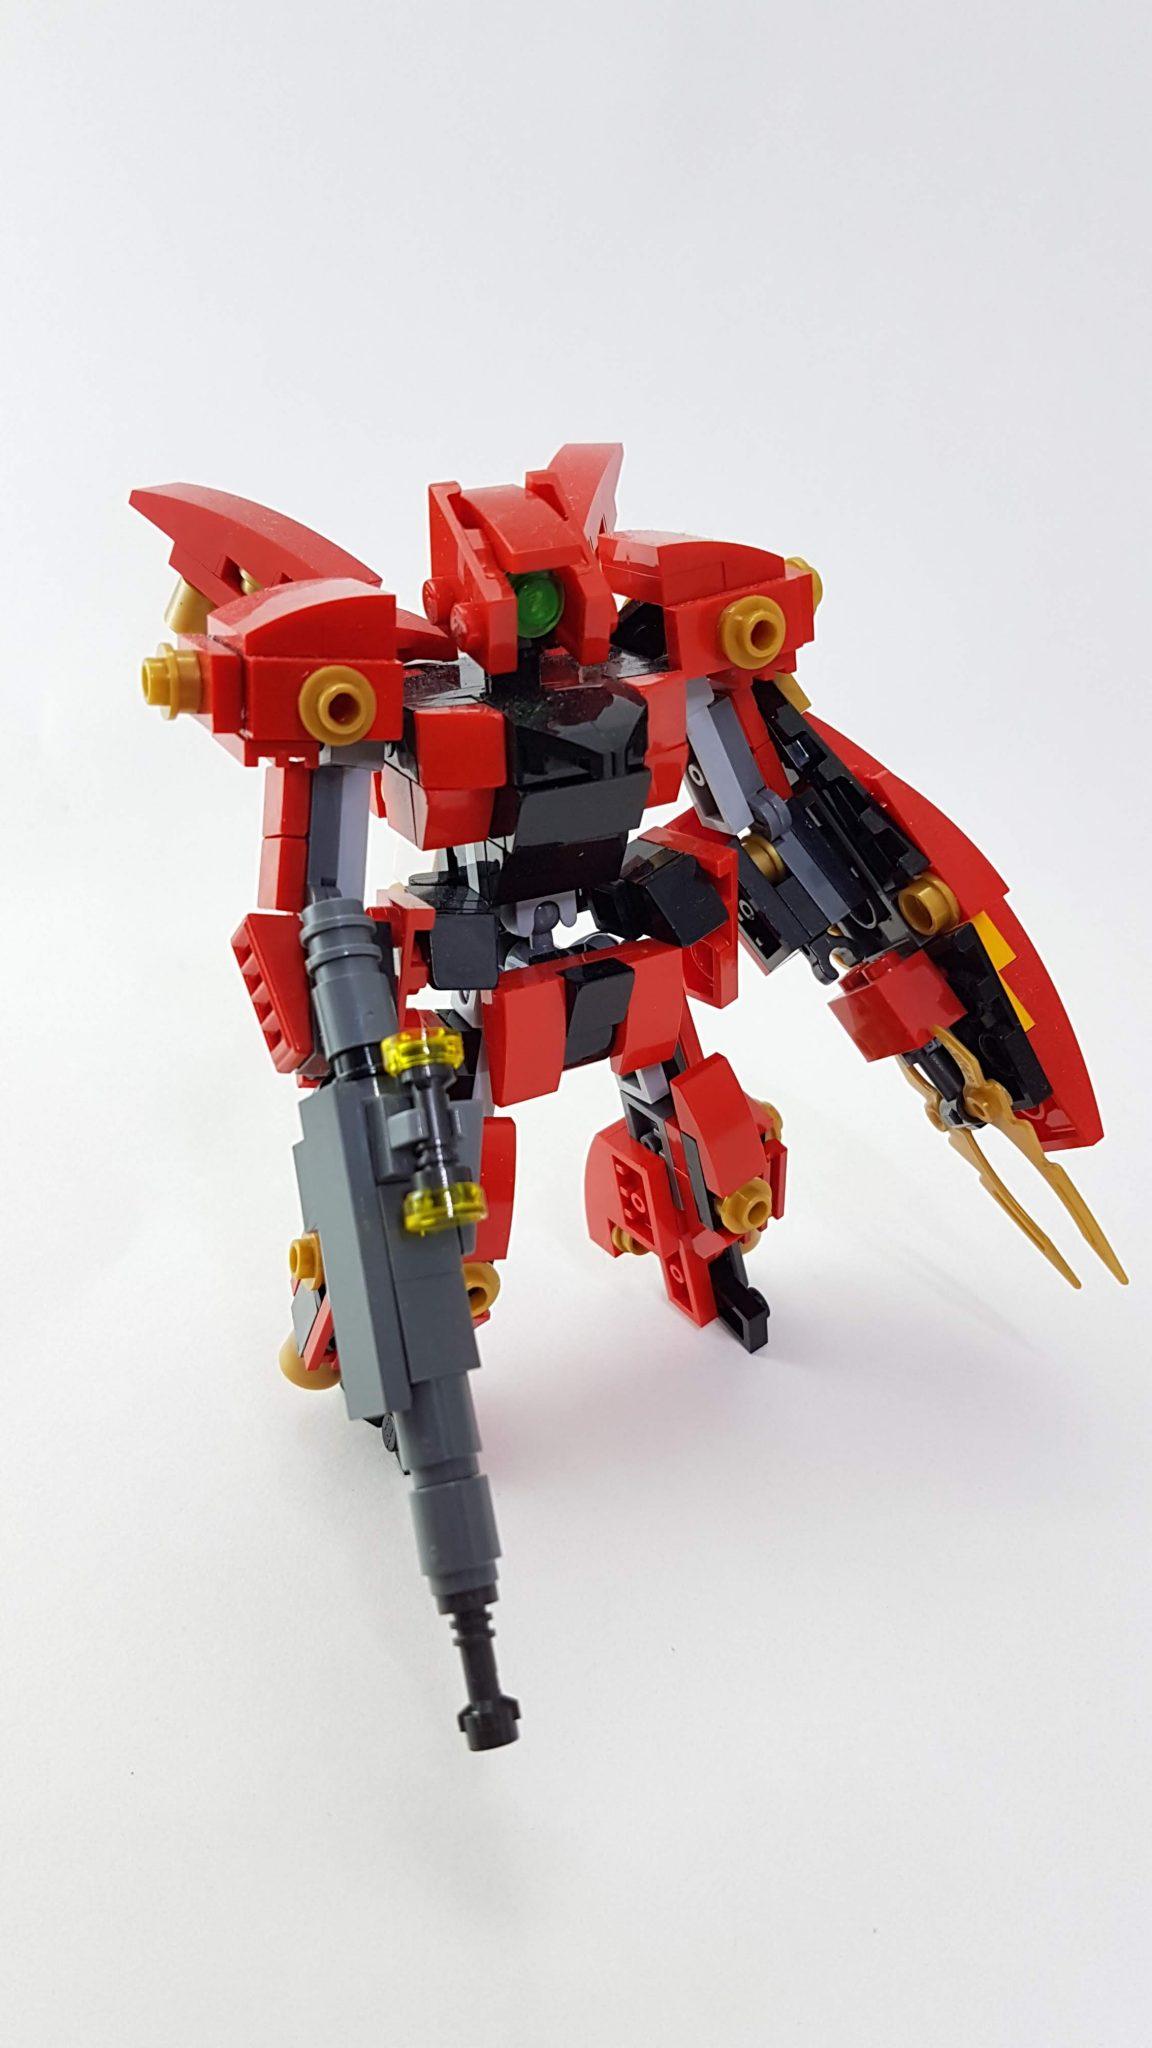 Lego Moc from Sinanju and Psycho Zaku Combined